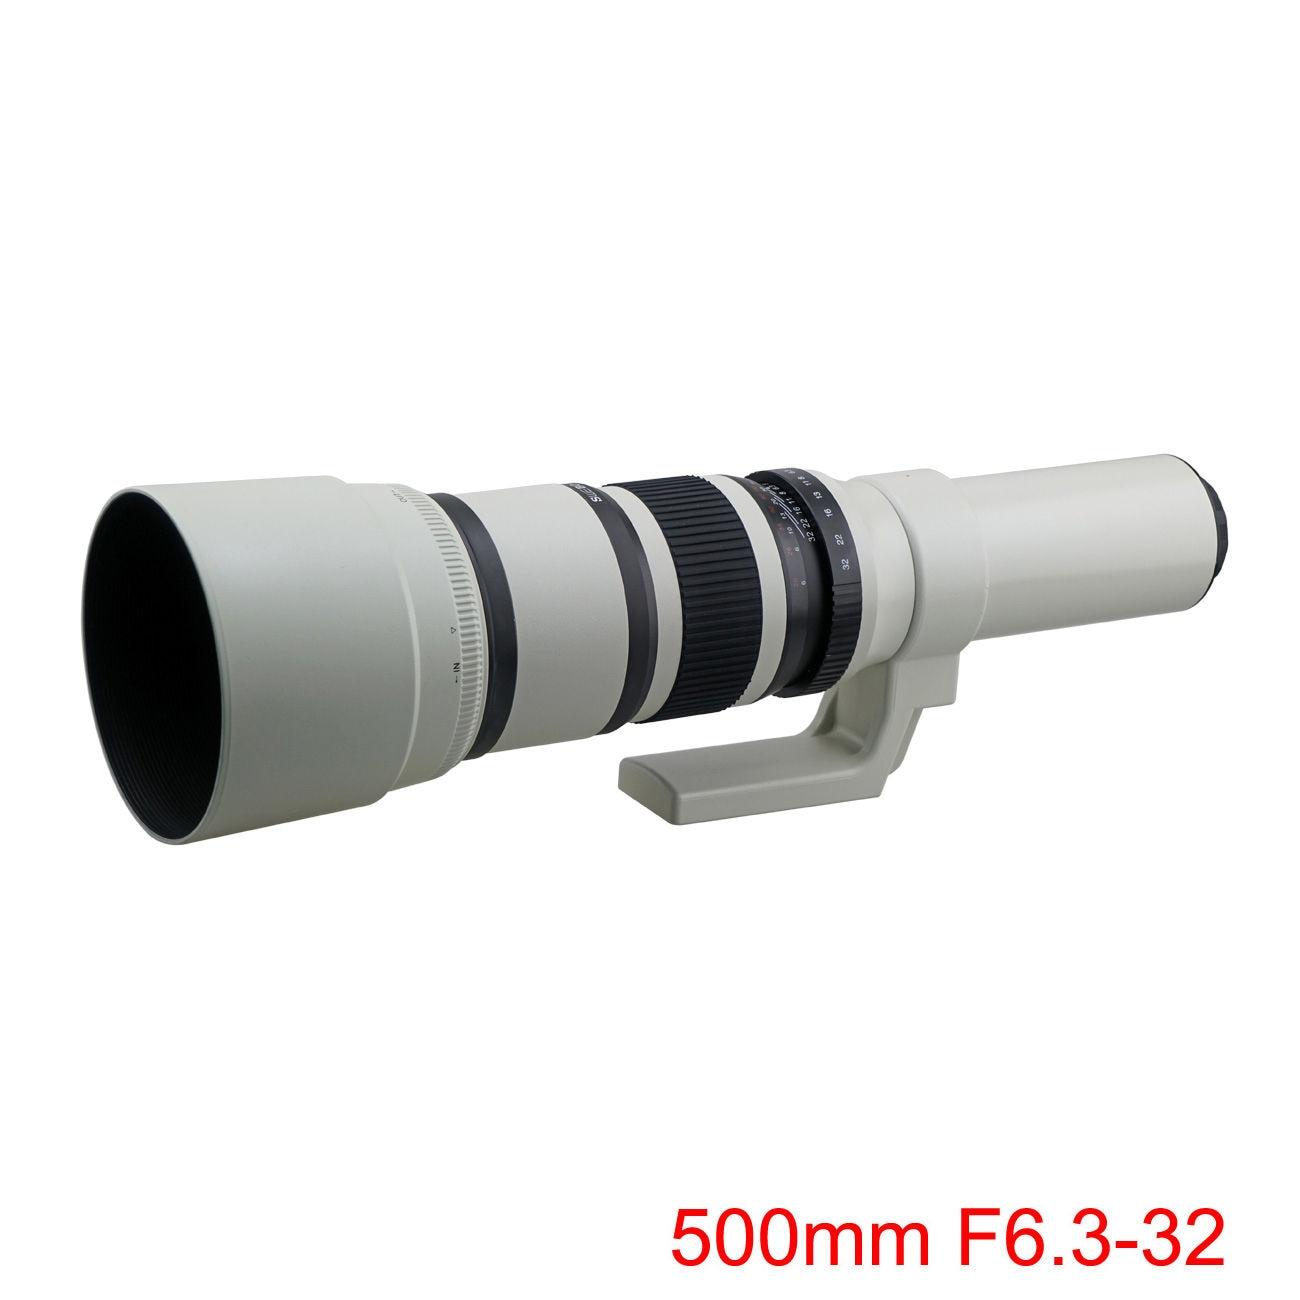 500mm F6.3-32 T Mount TELEPHOTO tele LENS white for Canon nikon sony pentax fuji olympus m43 nex mirrorless dslr camera